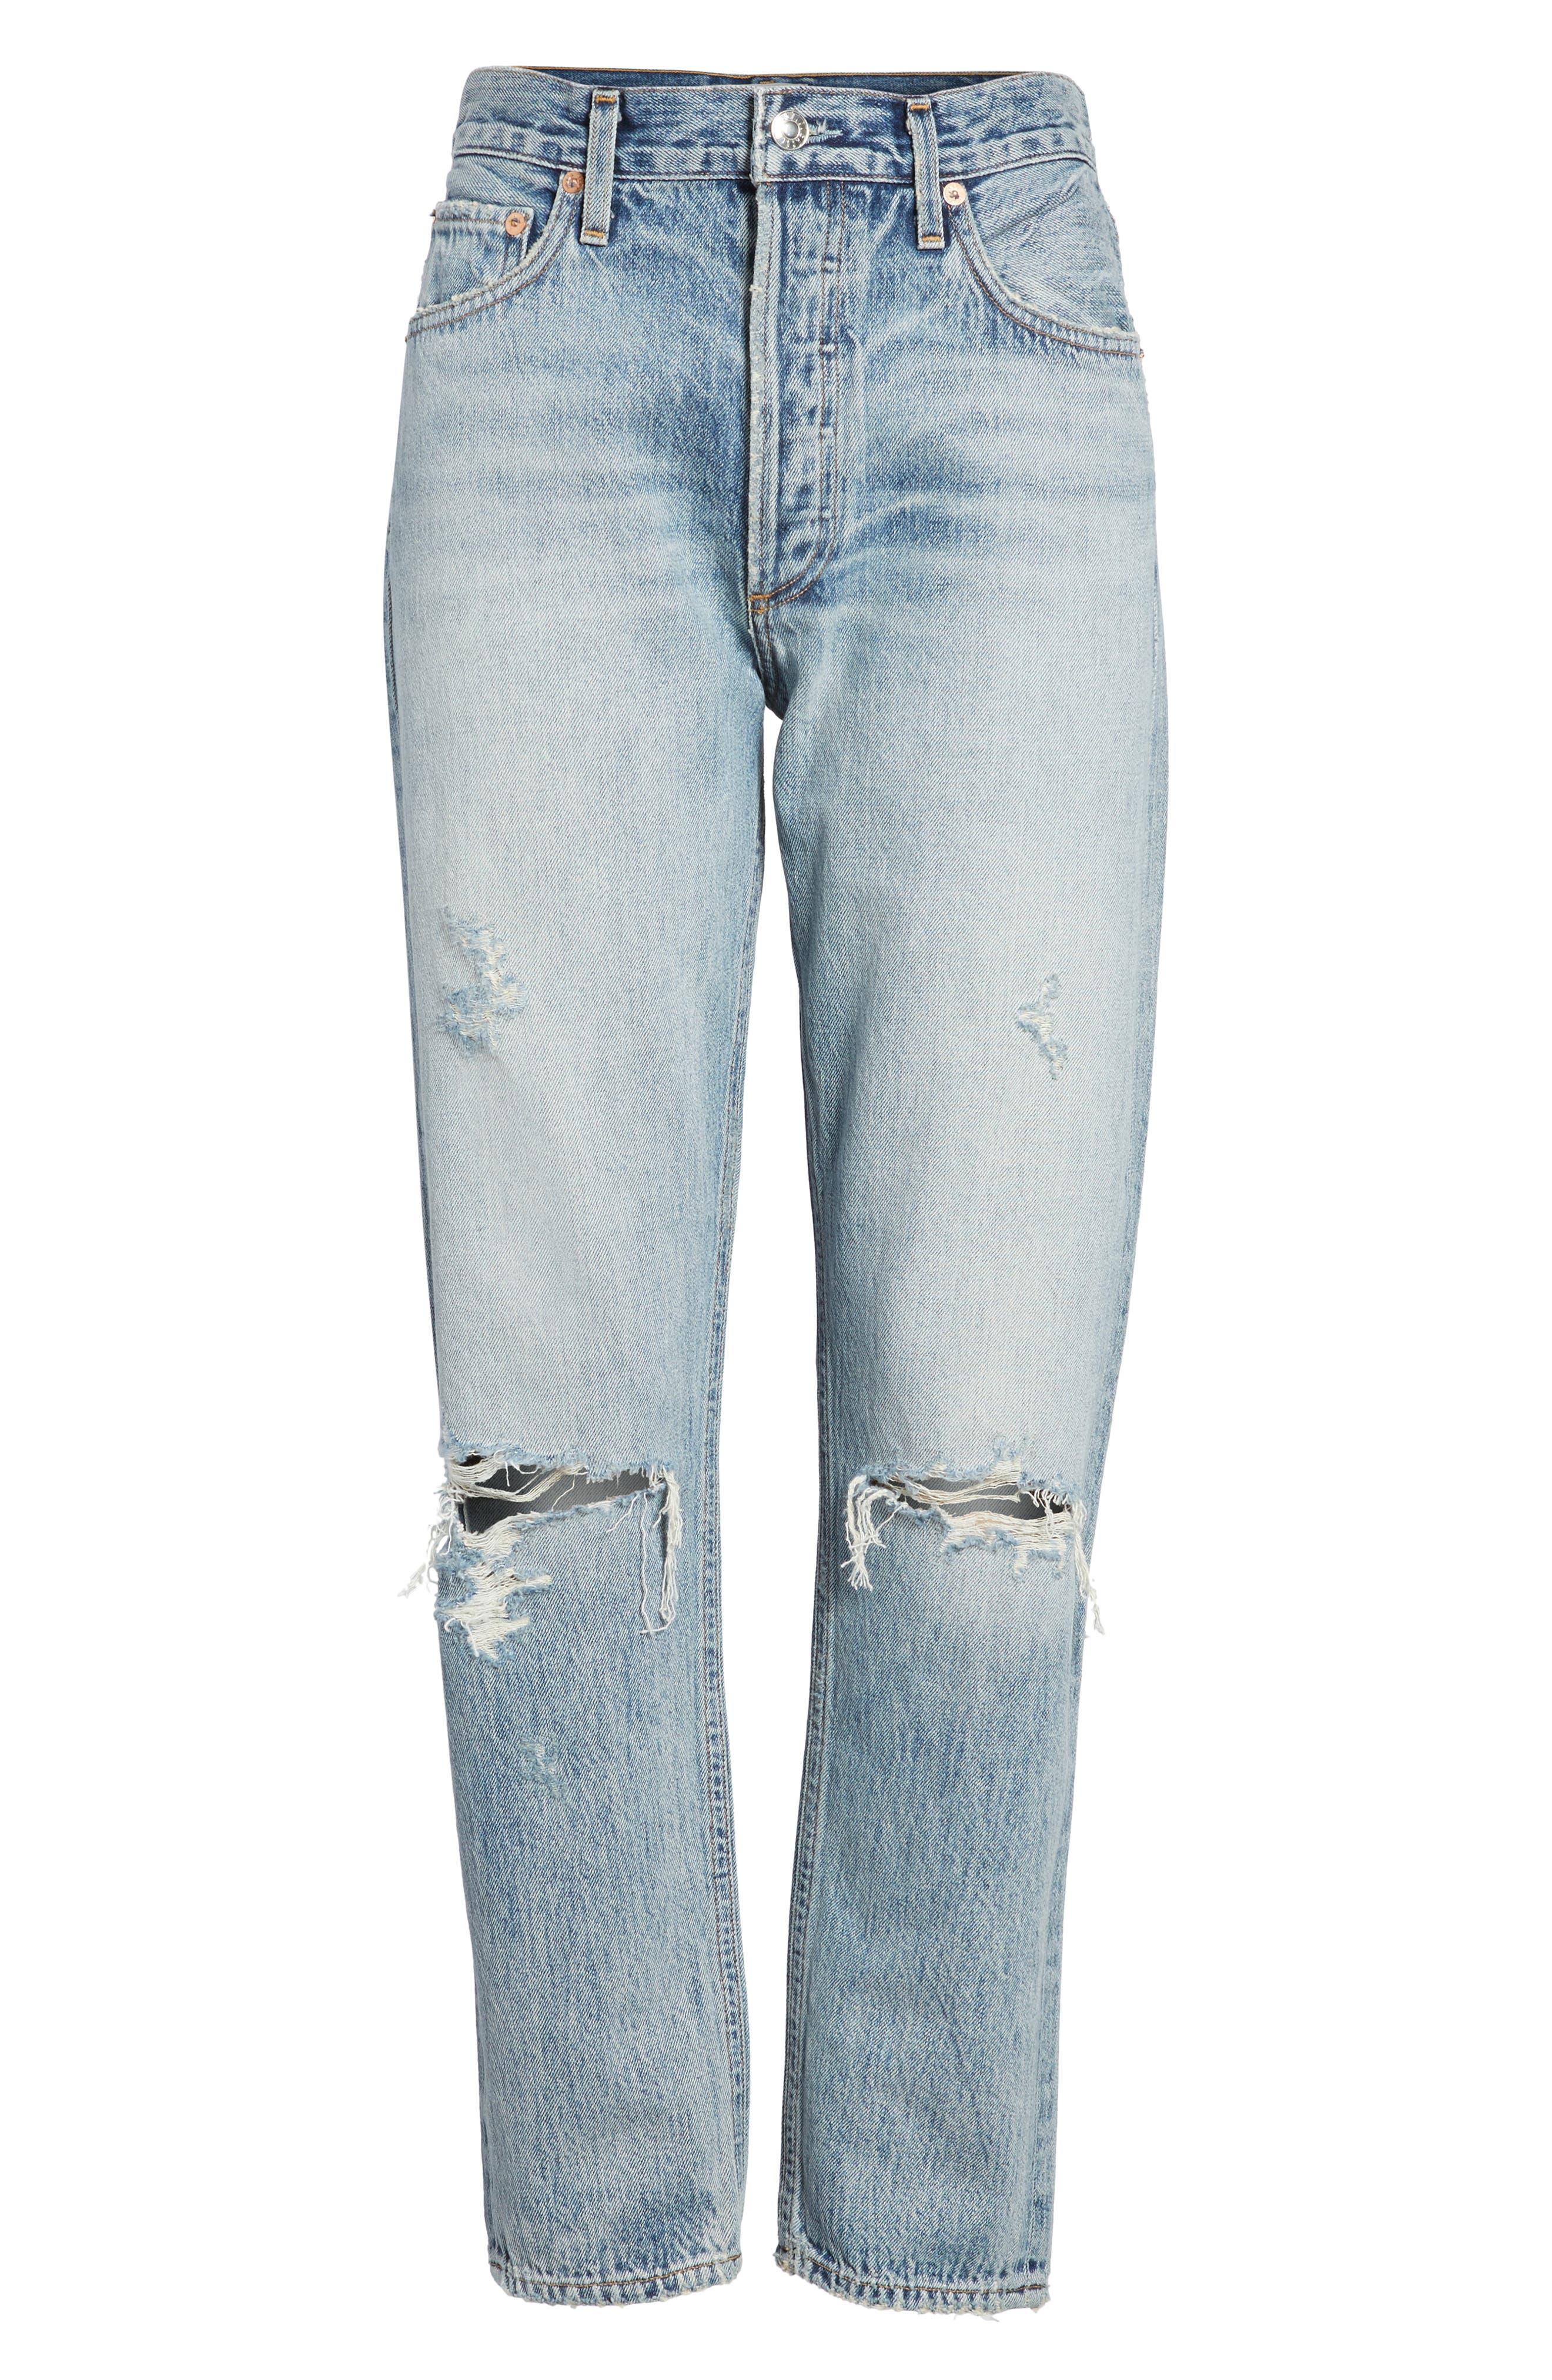 Jamie High Waist Ankle Jeans,                             Alternate thumbnail 6, color,                             RESOLUTION